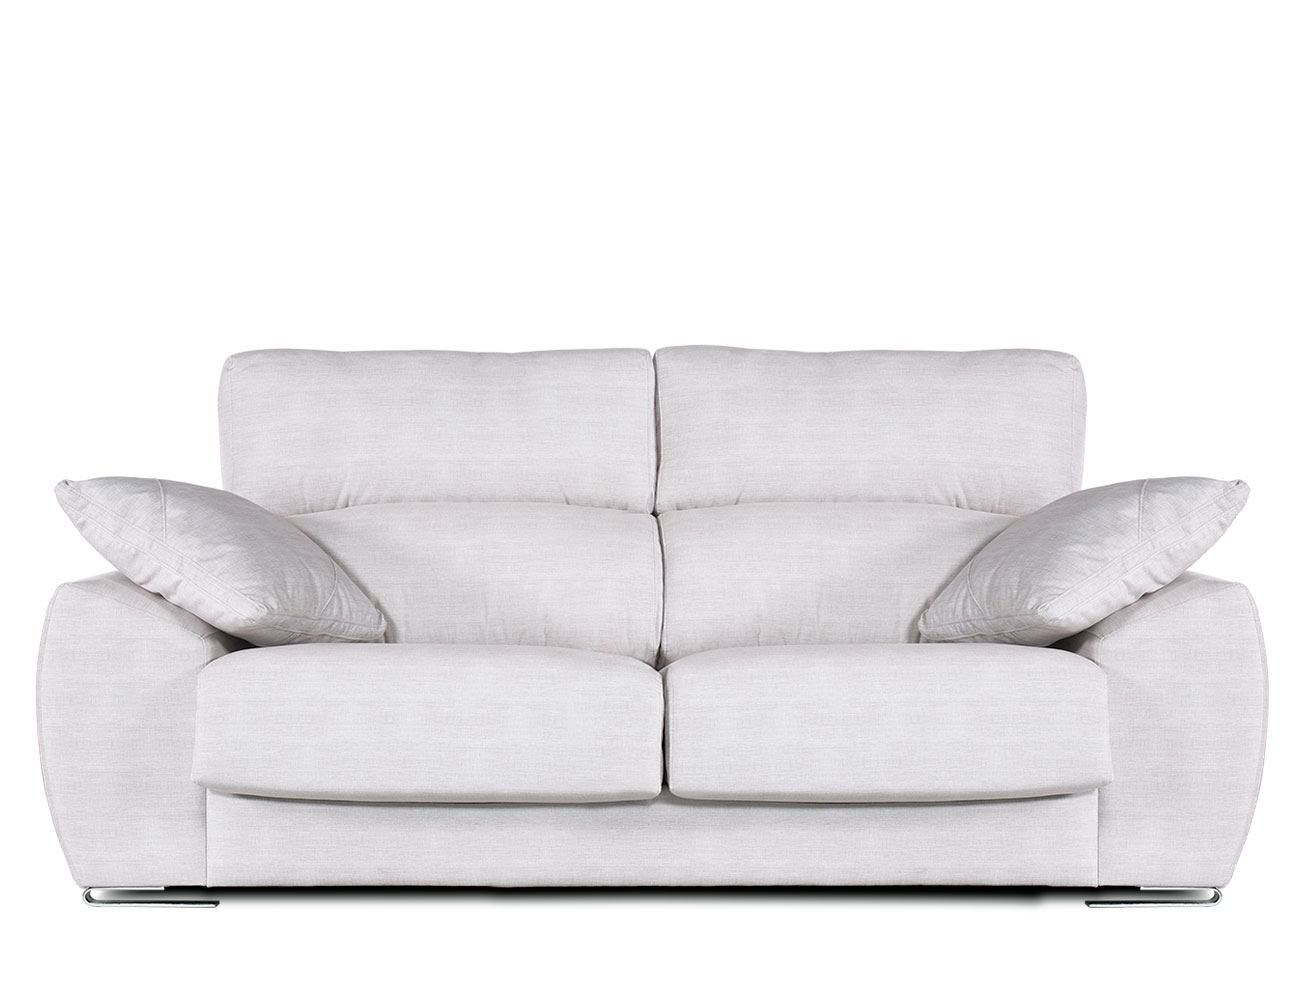 Sofa moderno 3plazas5